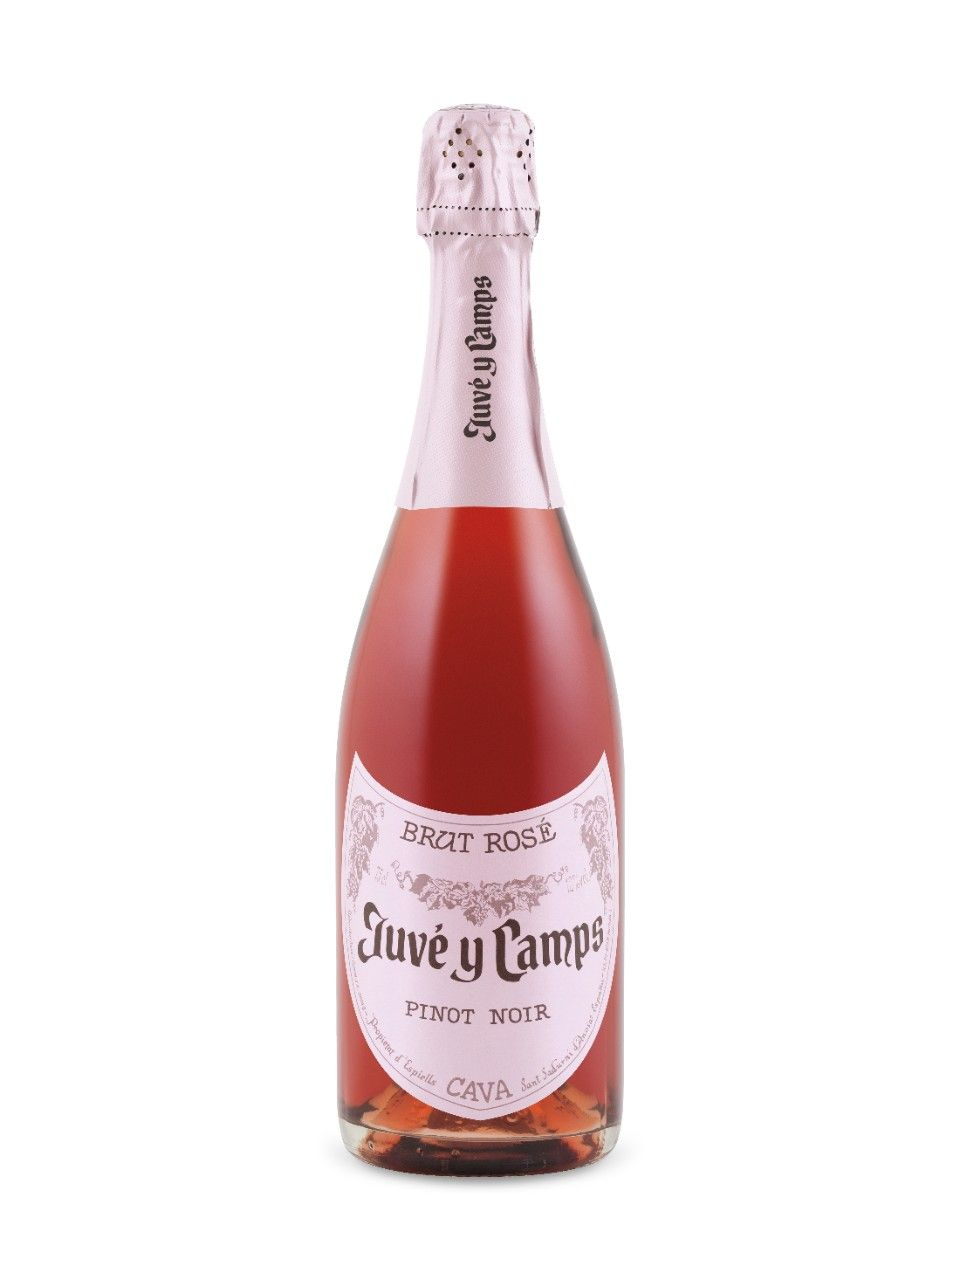 Juve Y Camps Reserva Brut Pinot Noir Rose Cava D O Spain Natalie S Score 89 100 Www Nataliemaclean Com Wine Reviews Juve Y Ca Wine Bottle Pinot Pinot Noir